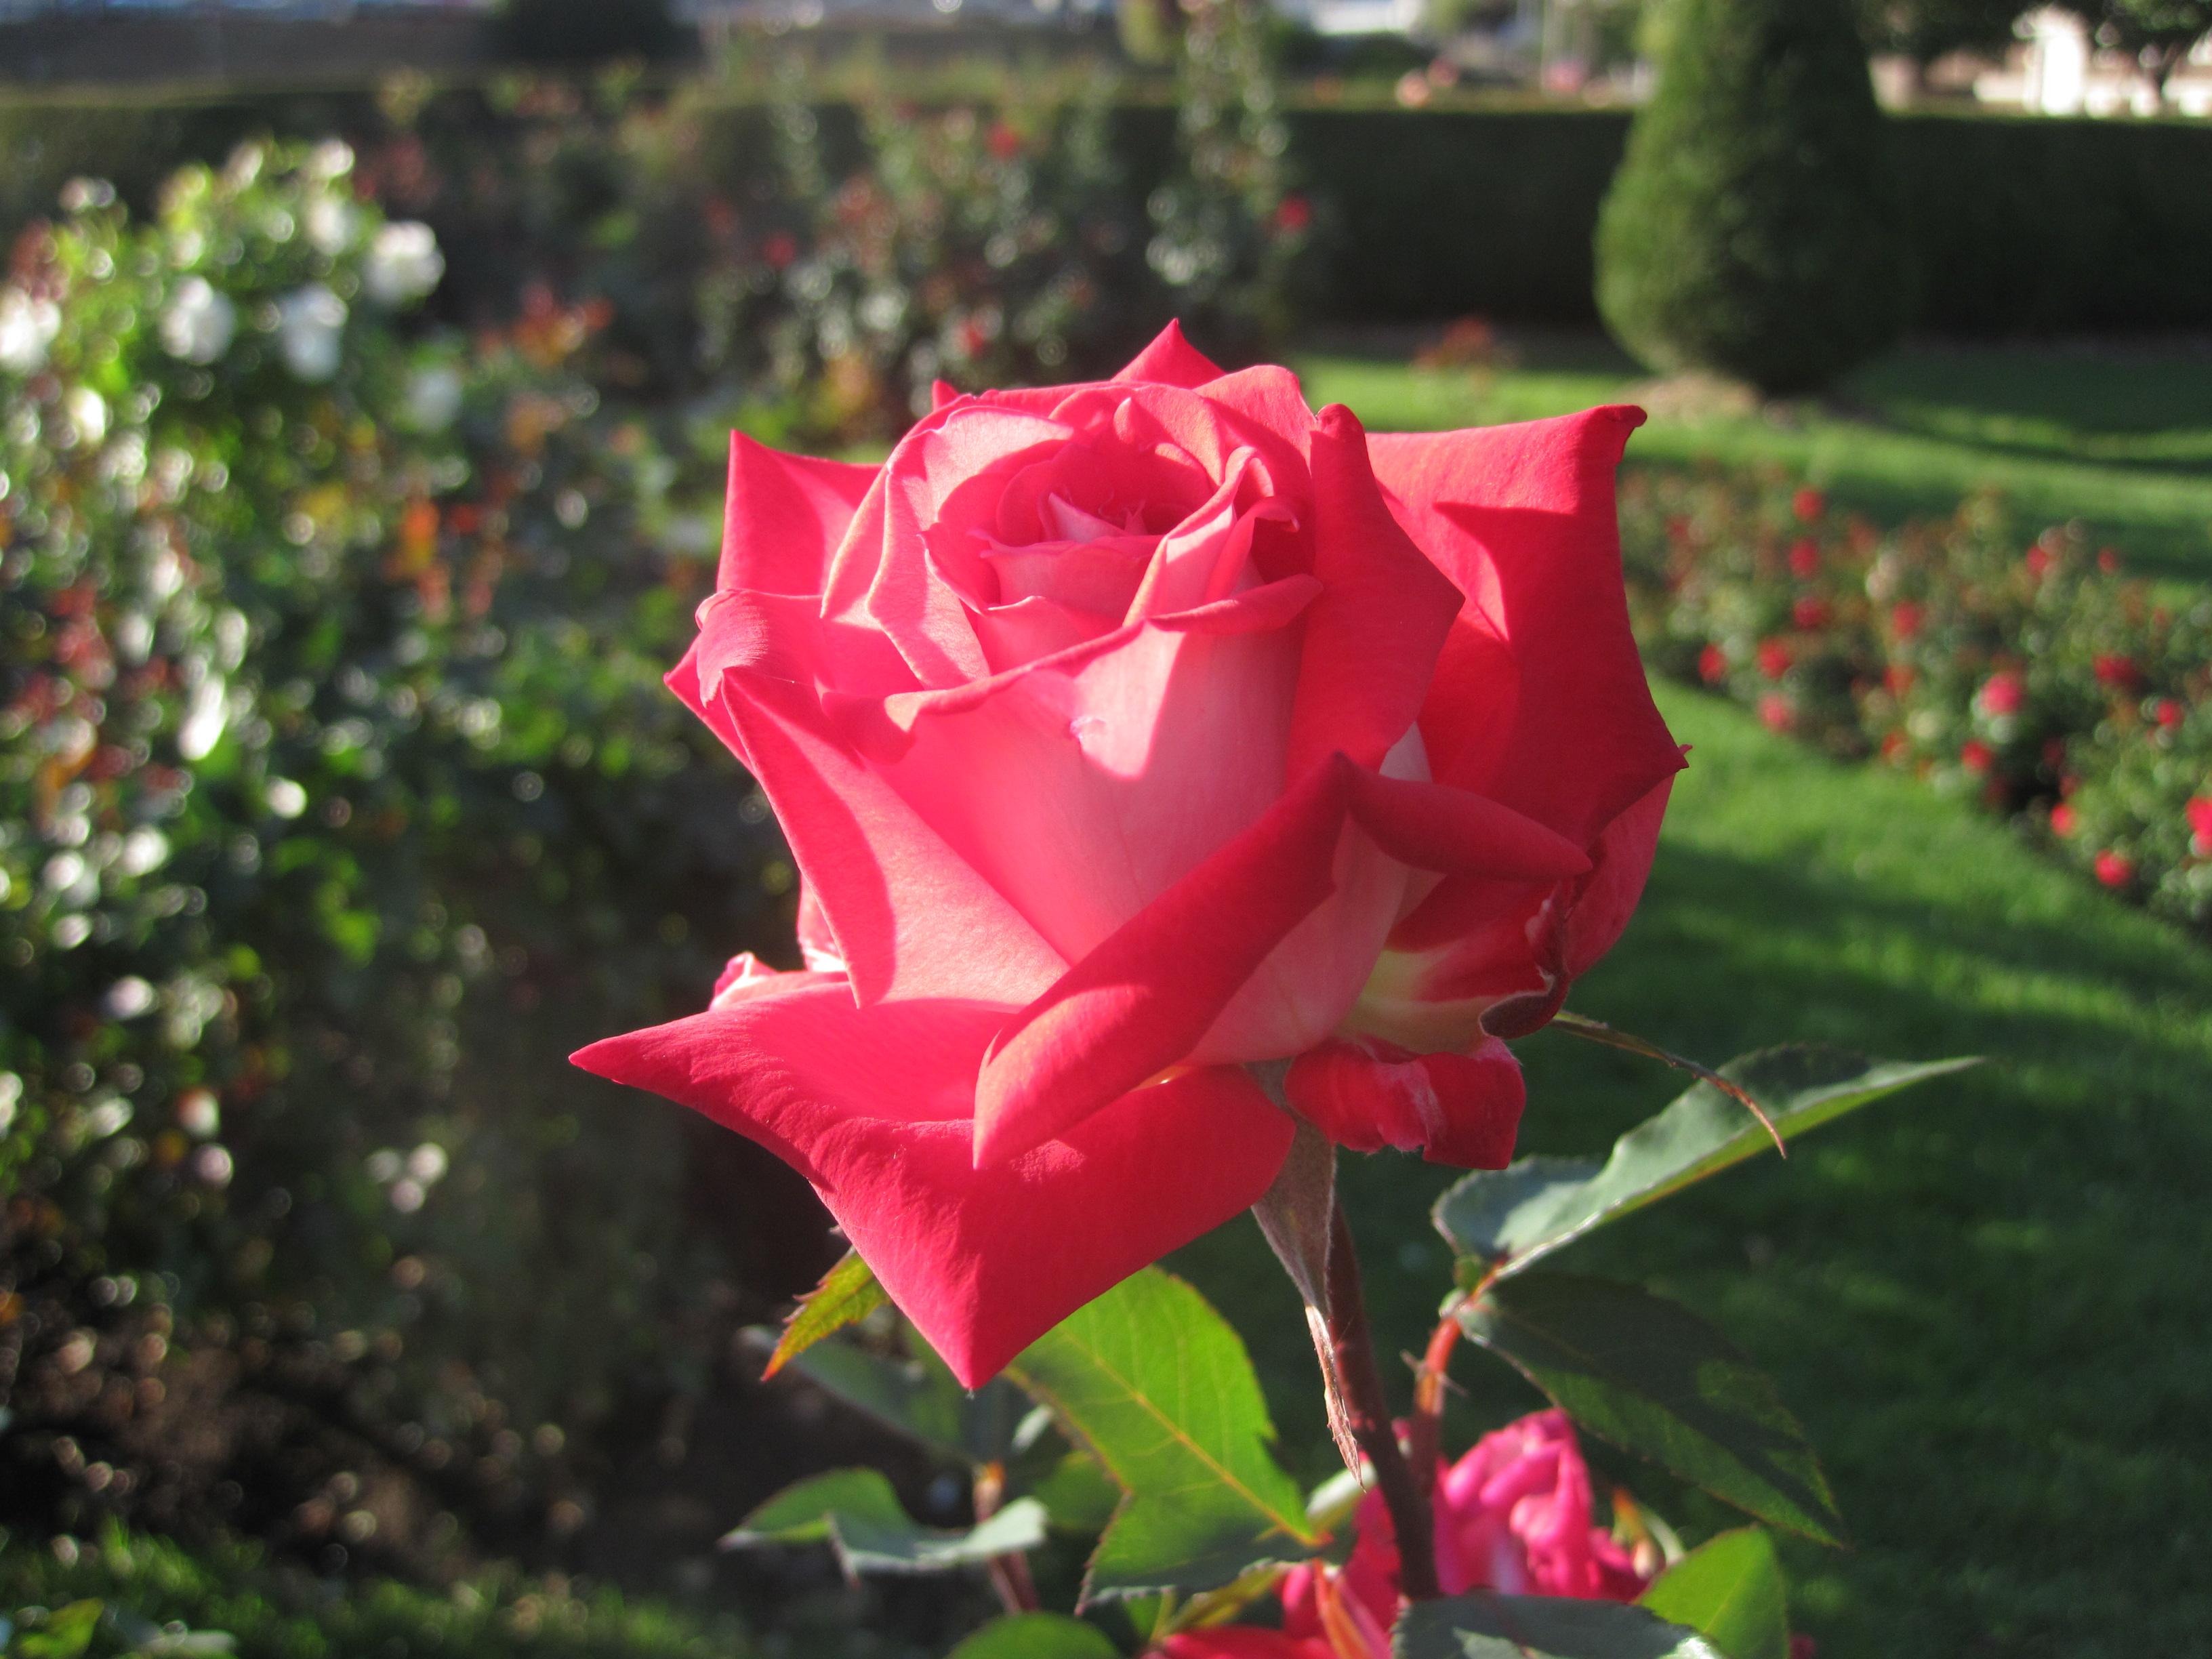 Roses at Leif Erikson Rose Garden 1